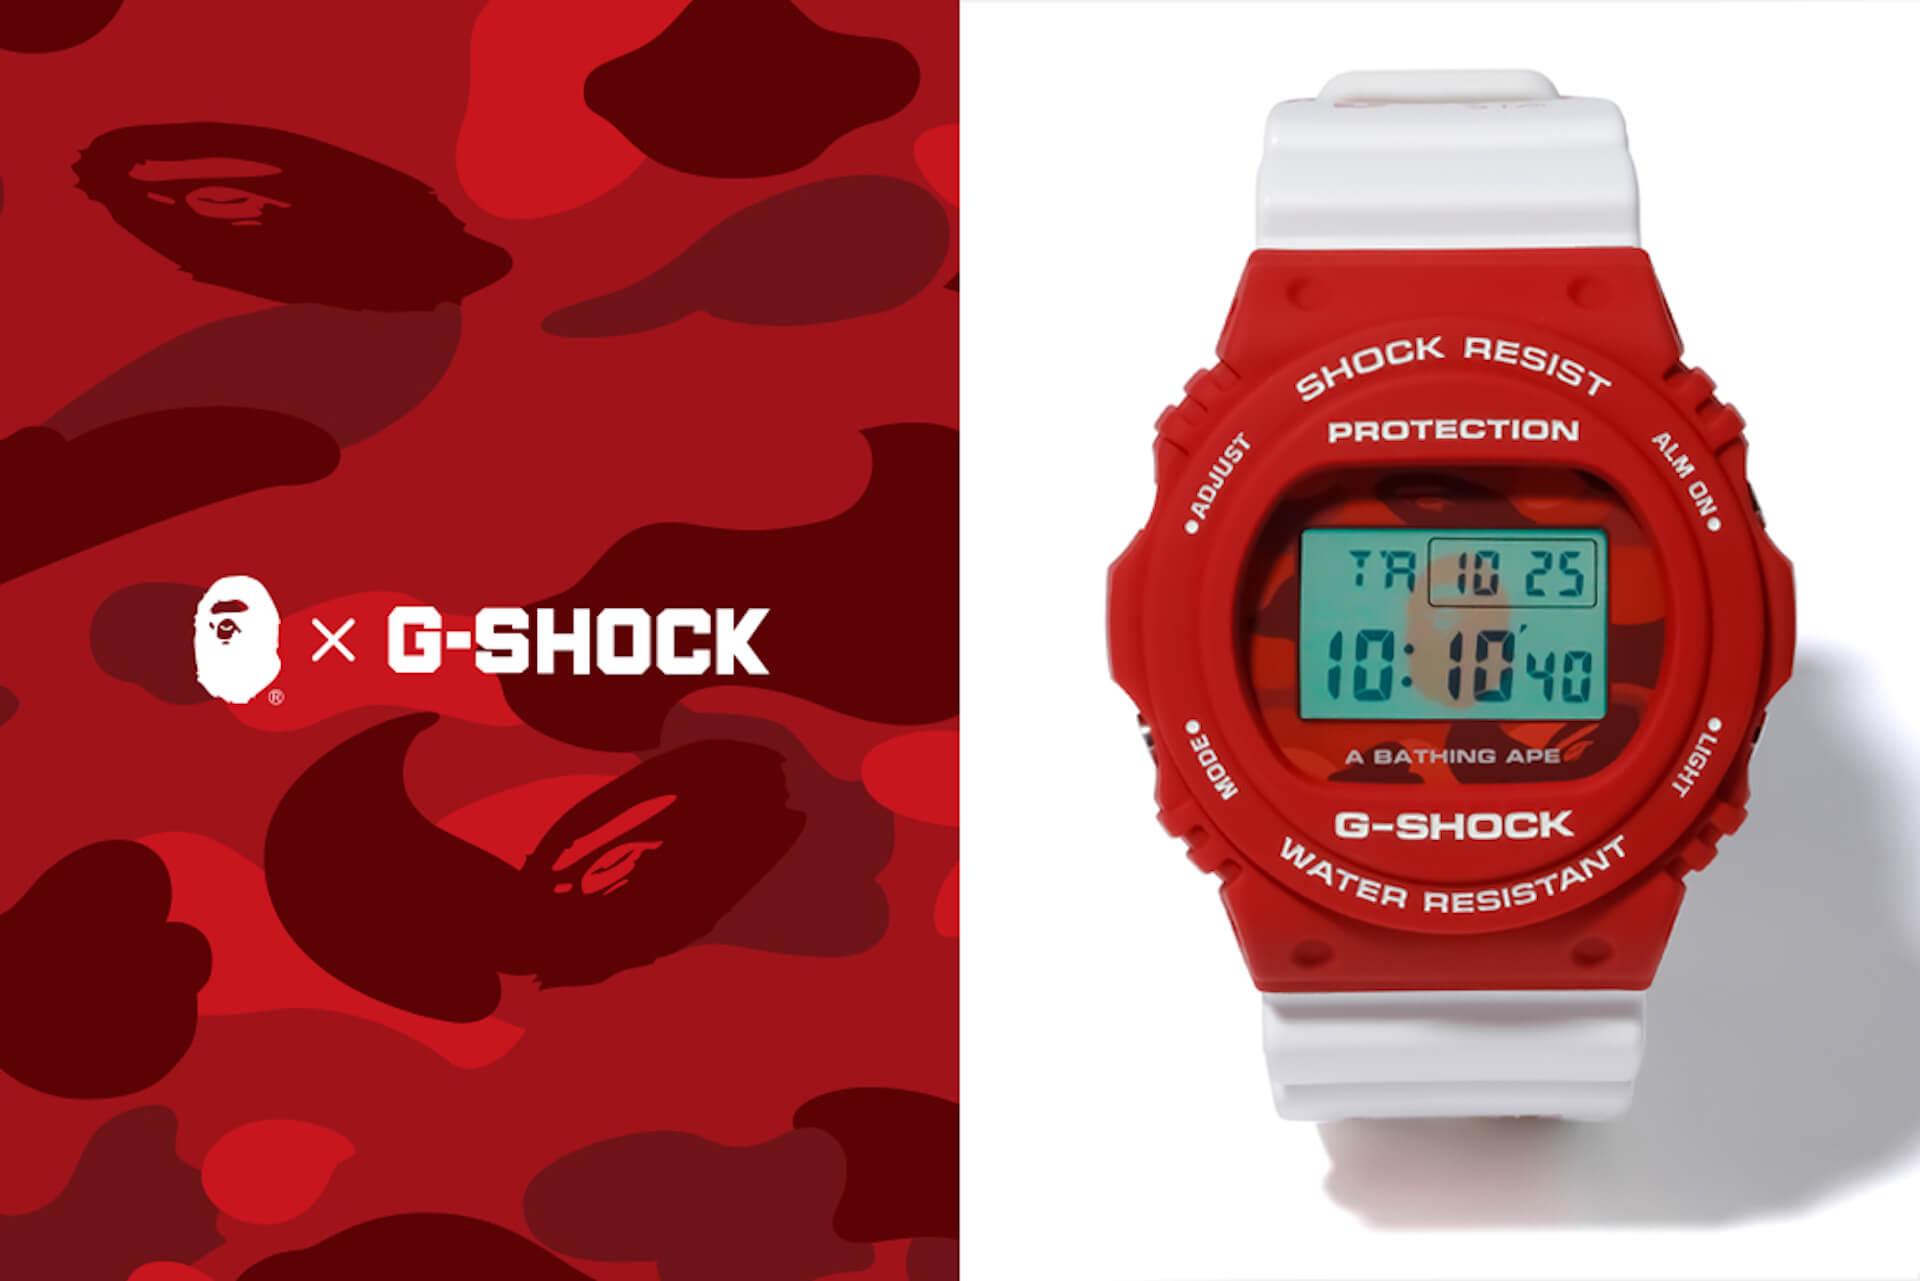 G-SHOCK「DW-5750」がA BATHING APE(R)カラー一色に!新型コラボモデルが登場 life200318_gshock_bape_1